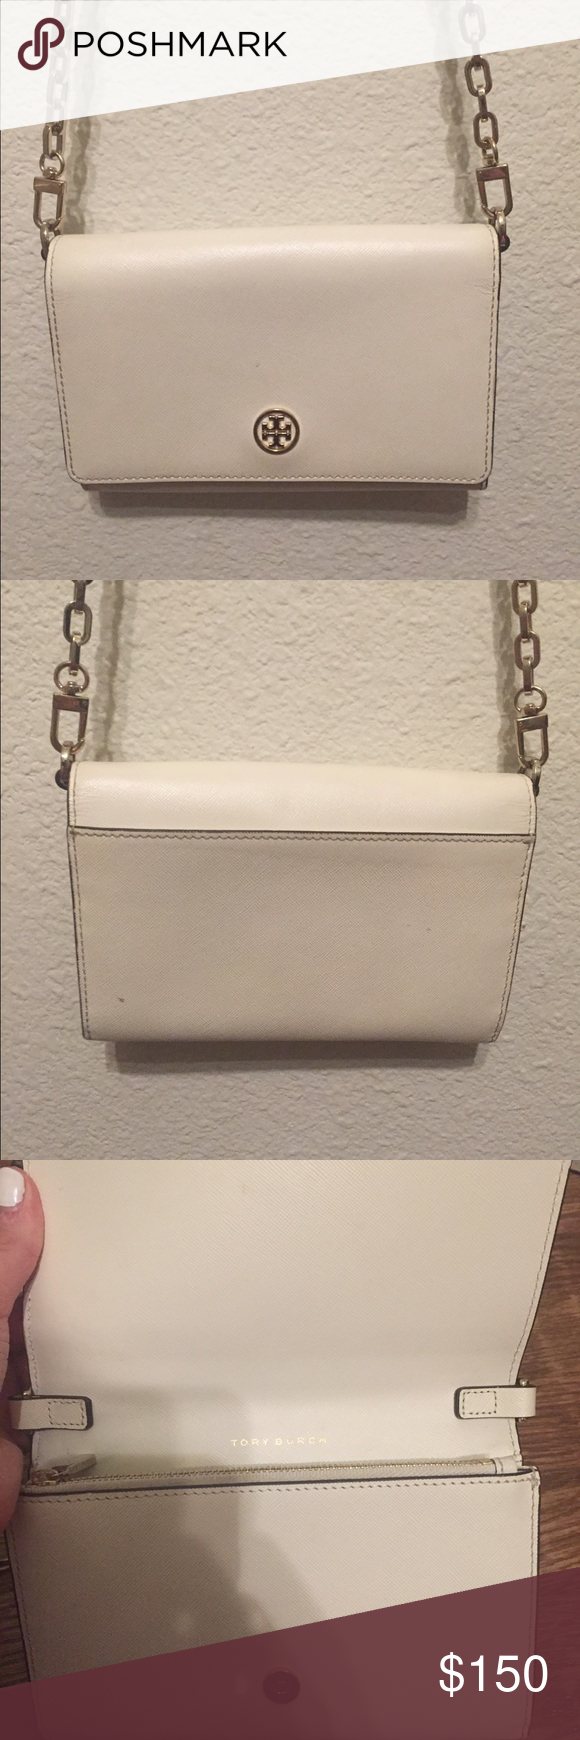 Tory burch wallet chain purse White Tory burch wallet chain cross body purse gently used Tory Burch Bags Crossbody Bags